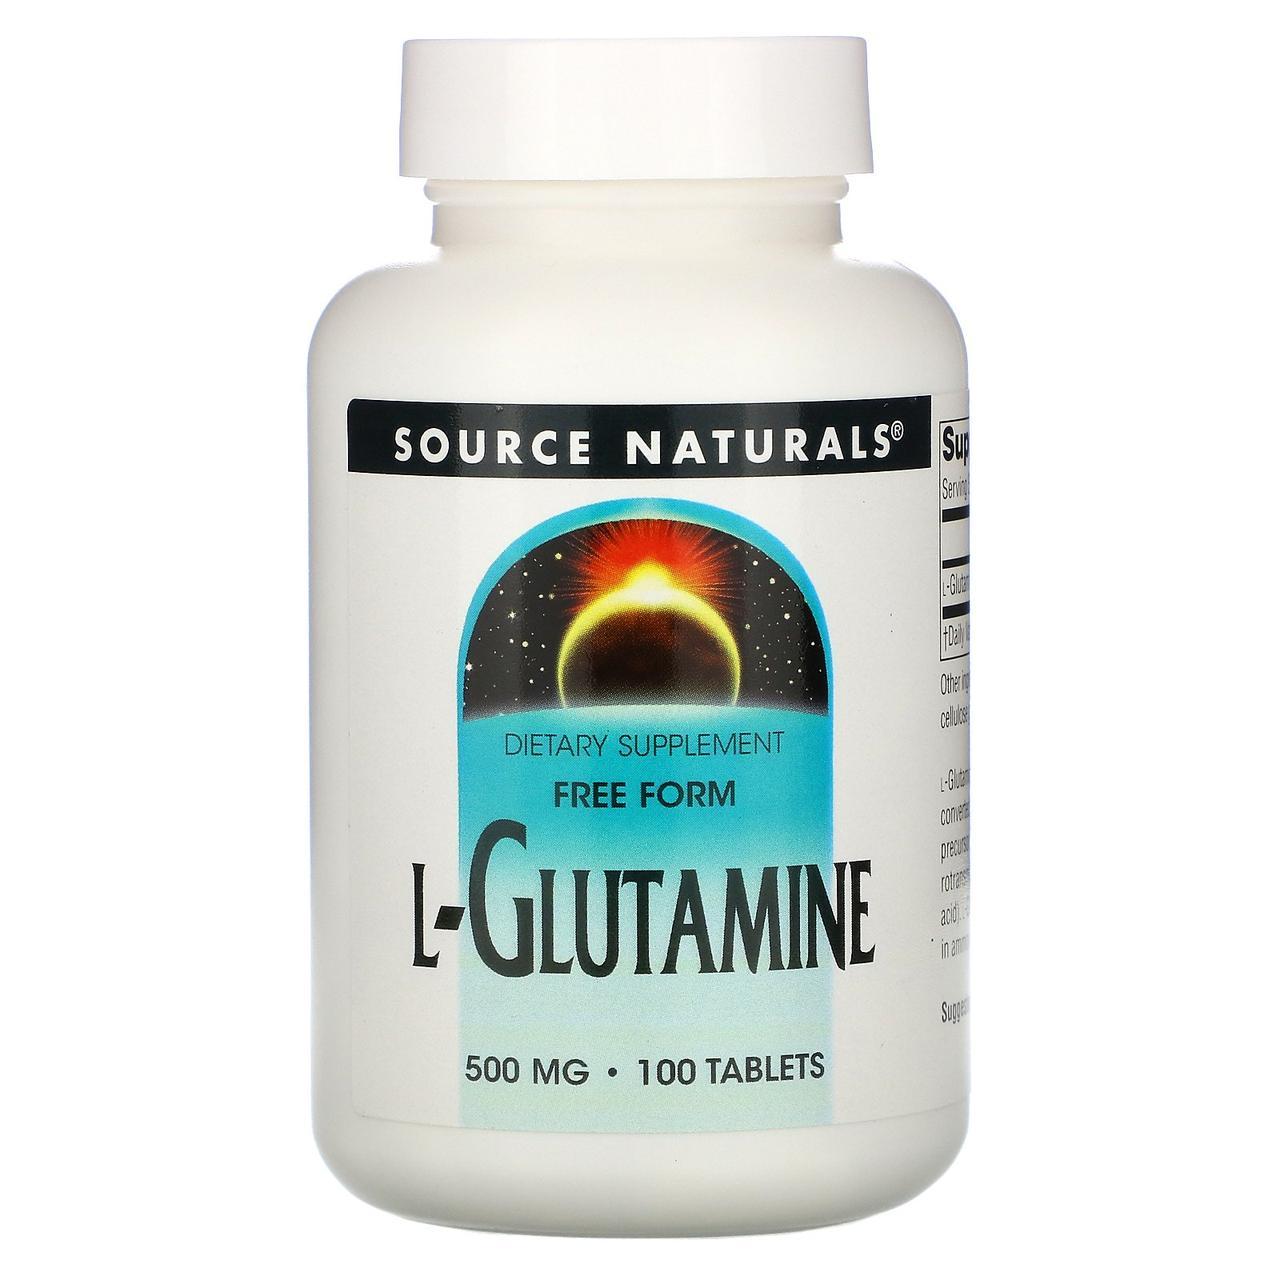 L-Глютамин, L-Glutamine, Source Naturals, 500 мг, 100 таблеток